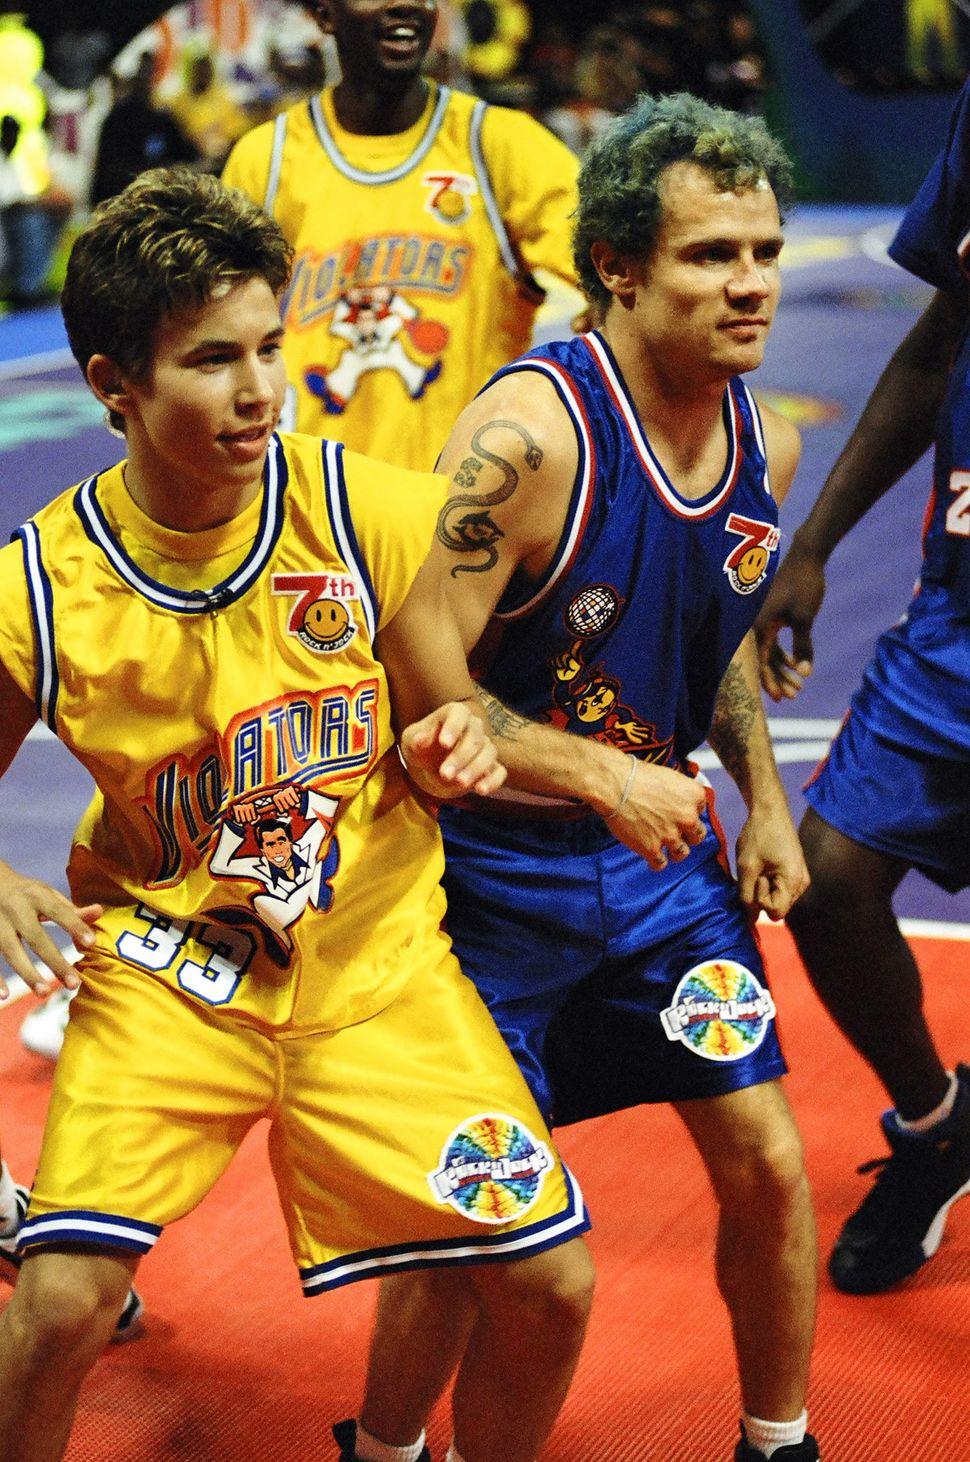 MTV Rock N' Jock Basketball, 1997